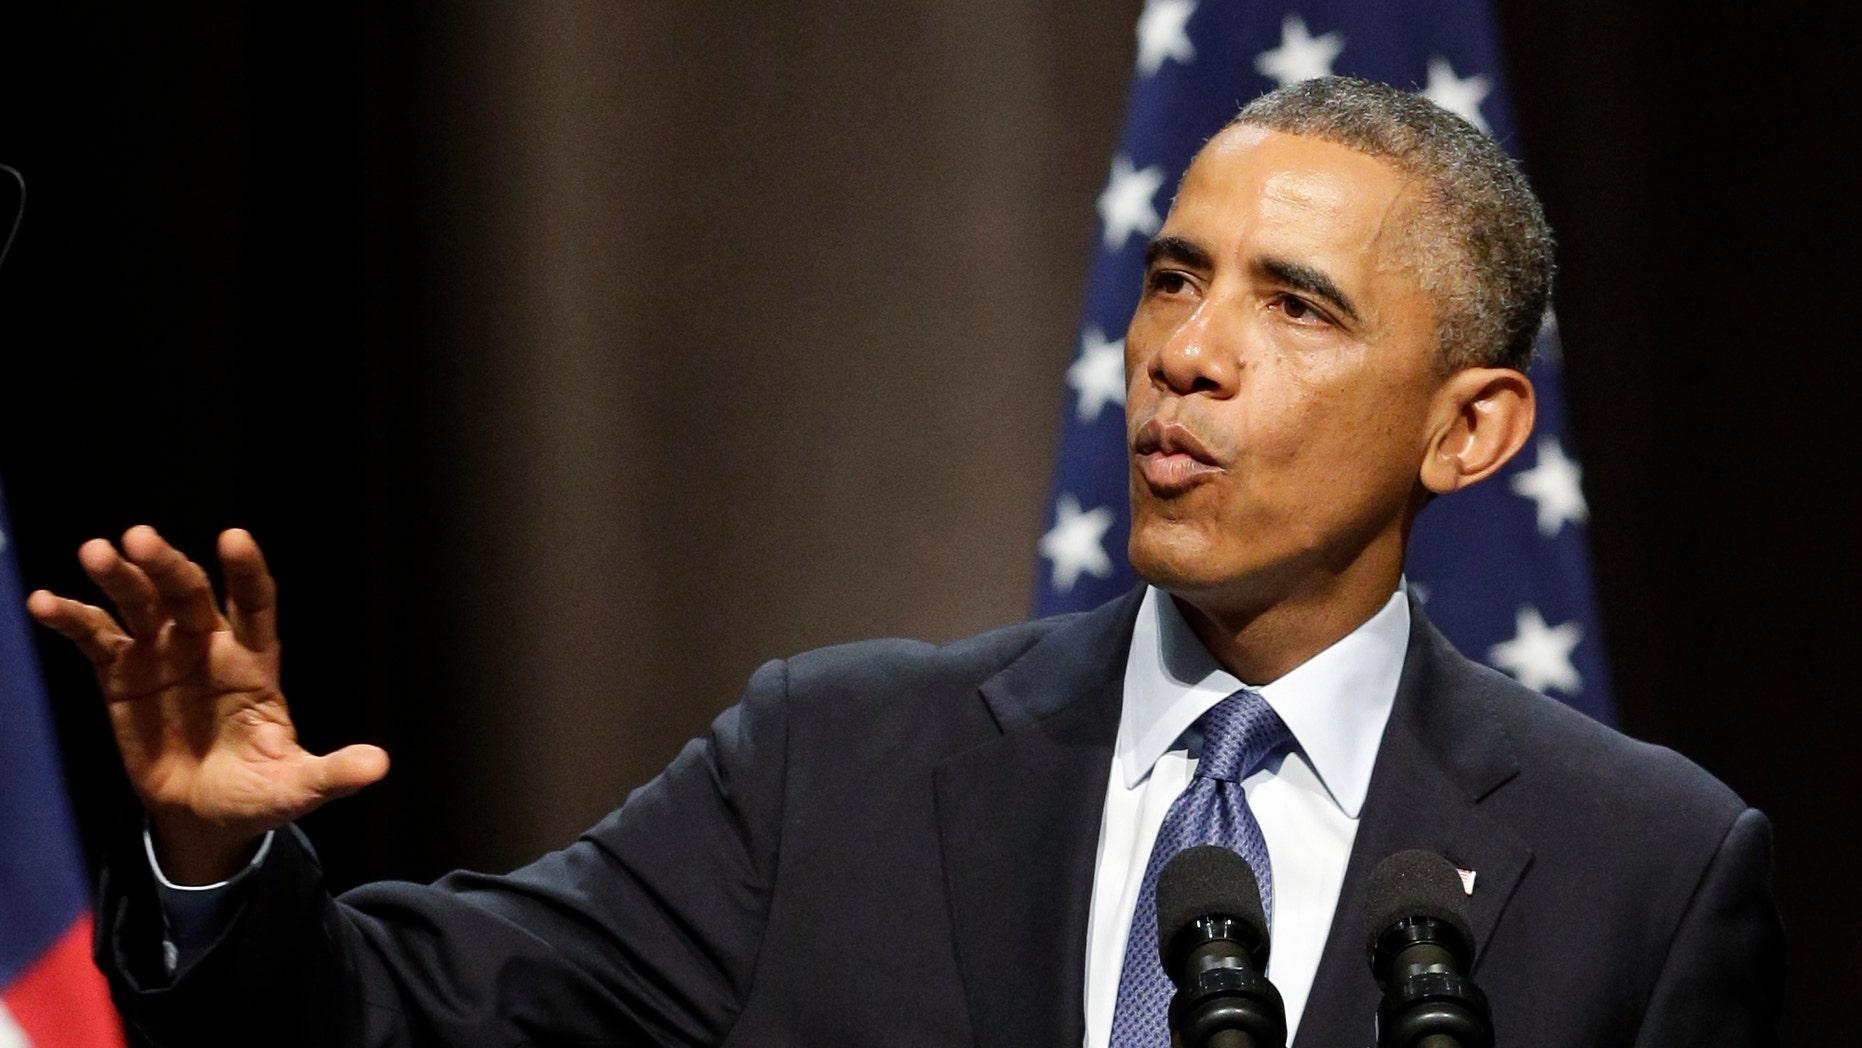 Oct. 2, 2014: President Barack Obama speaks about the economy at Northwestern University in Evanston, Ill.